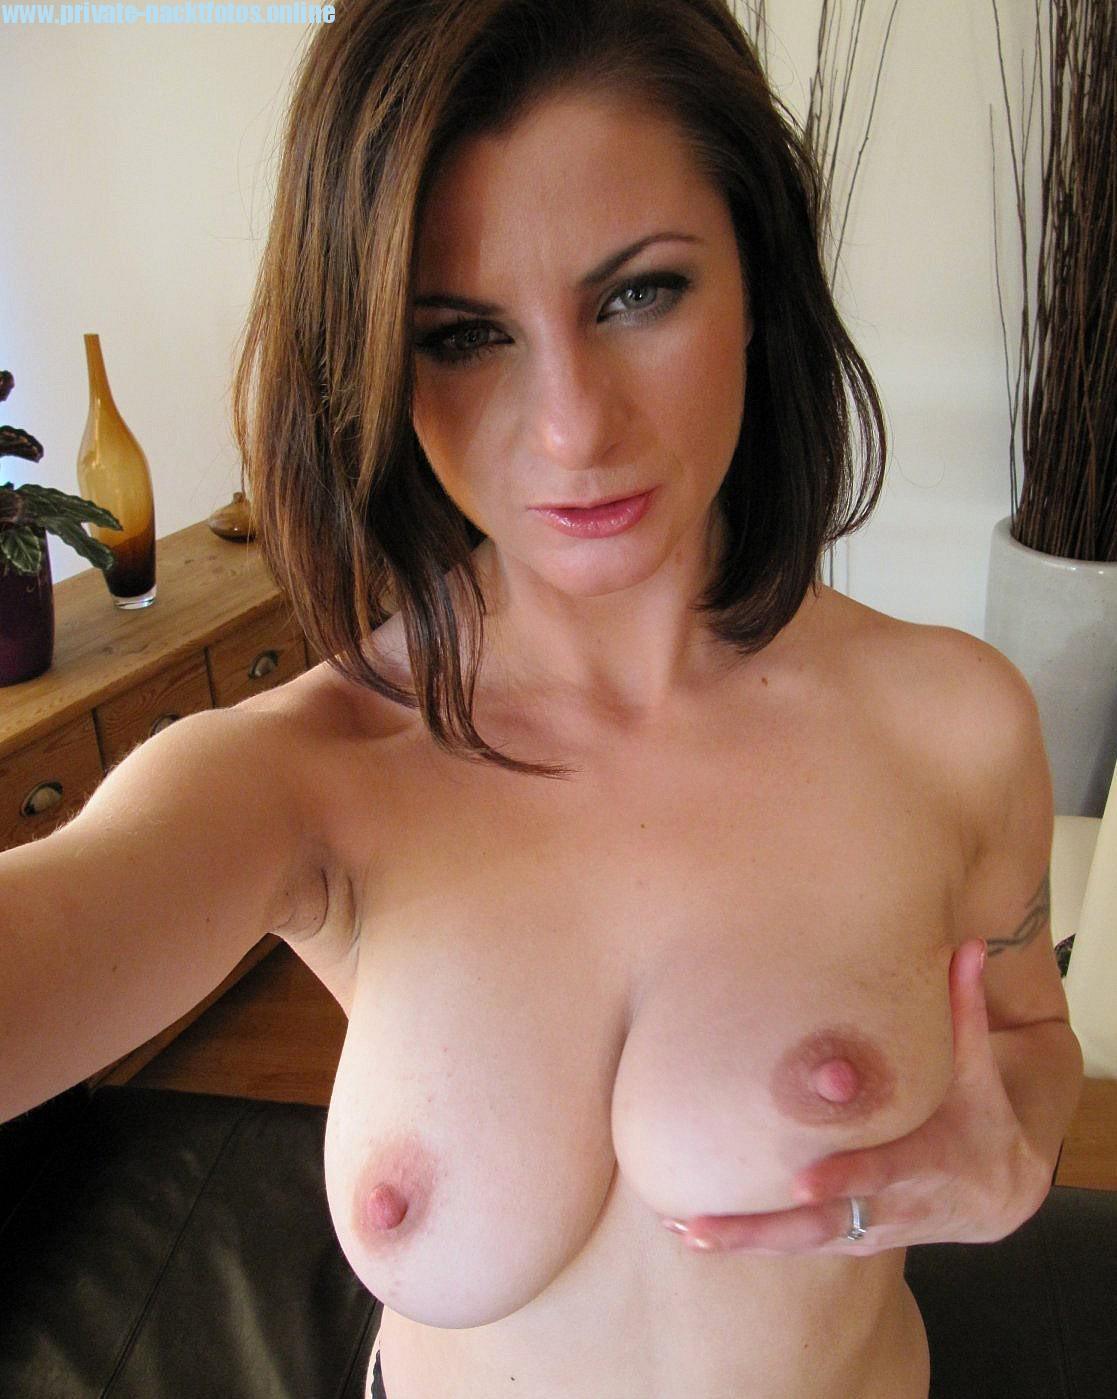 Selfie titten